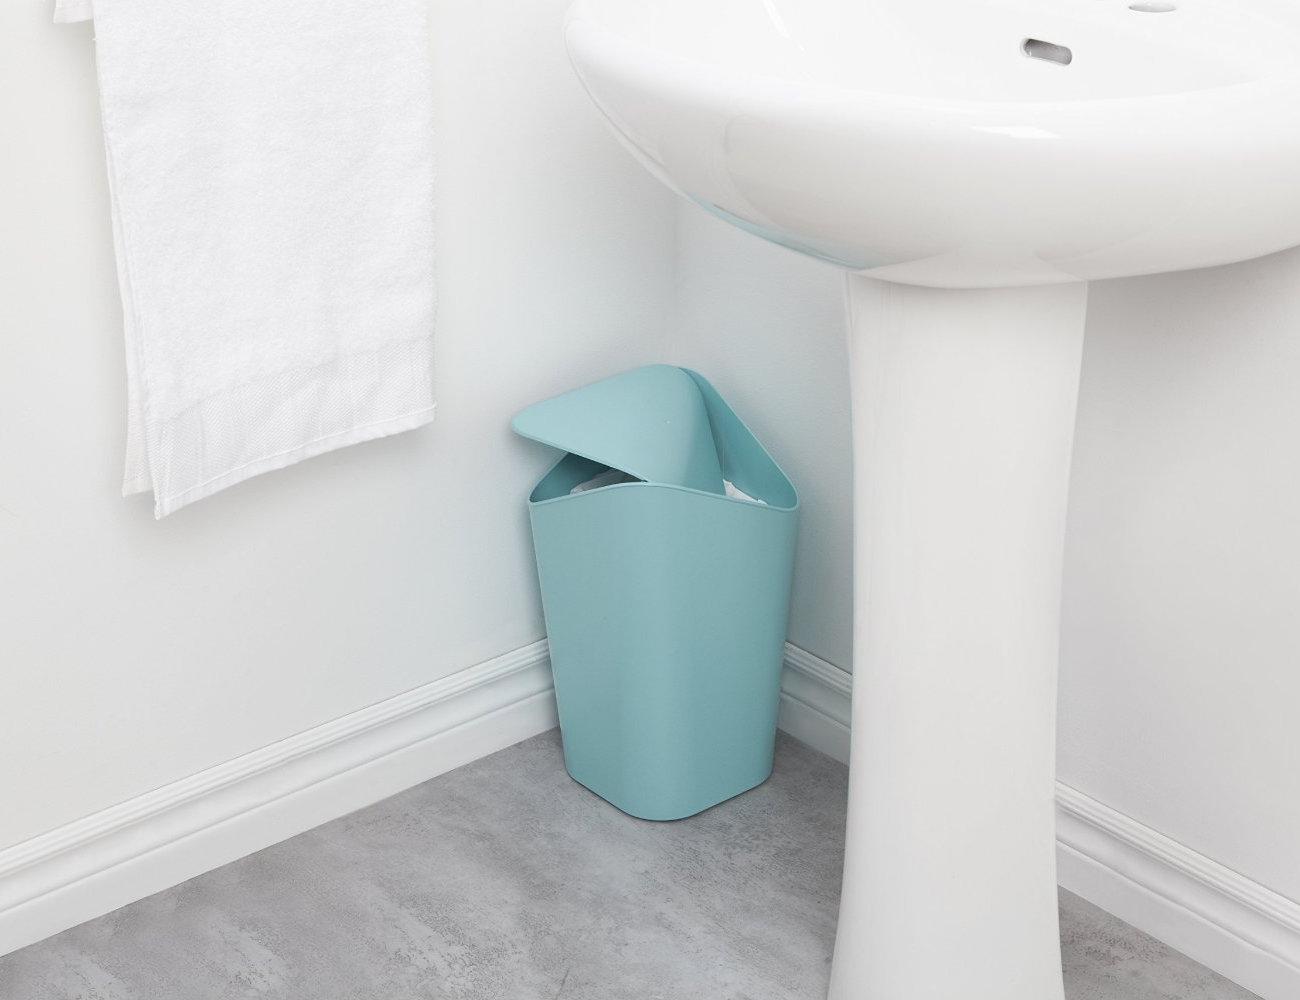 Corner waste bin perfect waste bin for corners review - Corner wastebasket ...